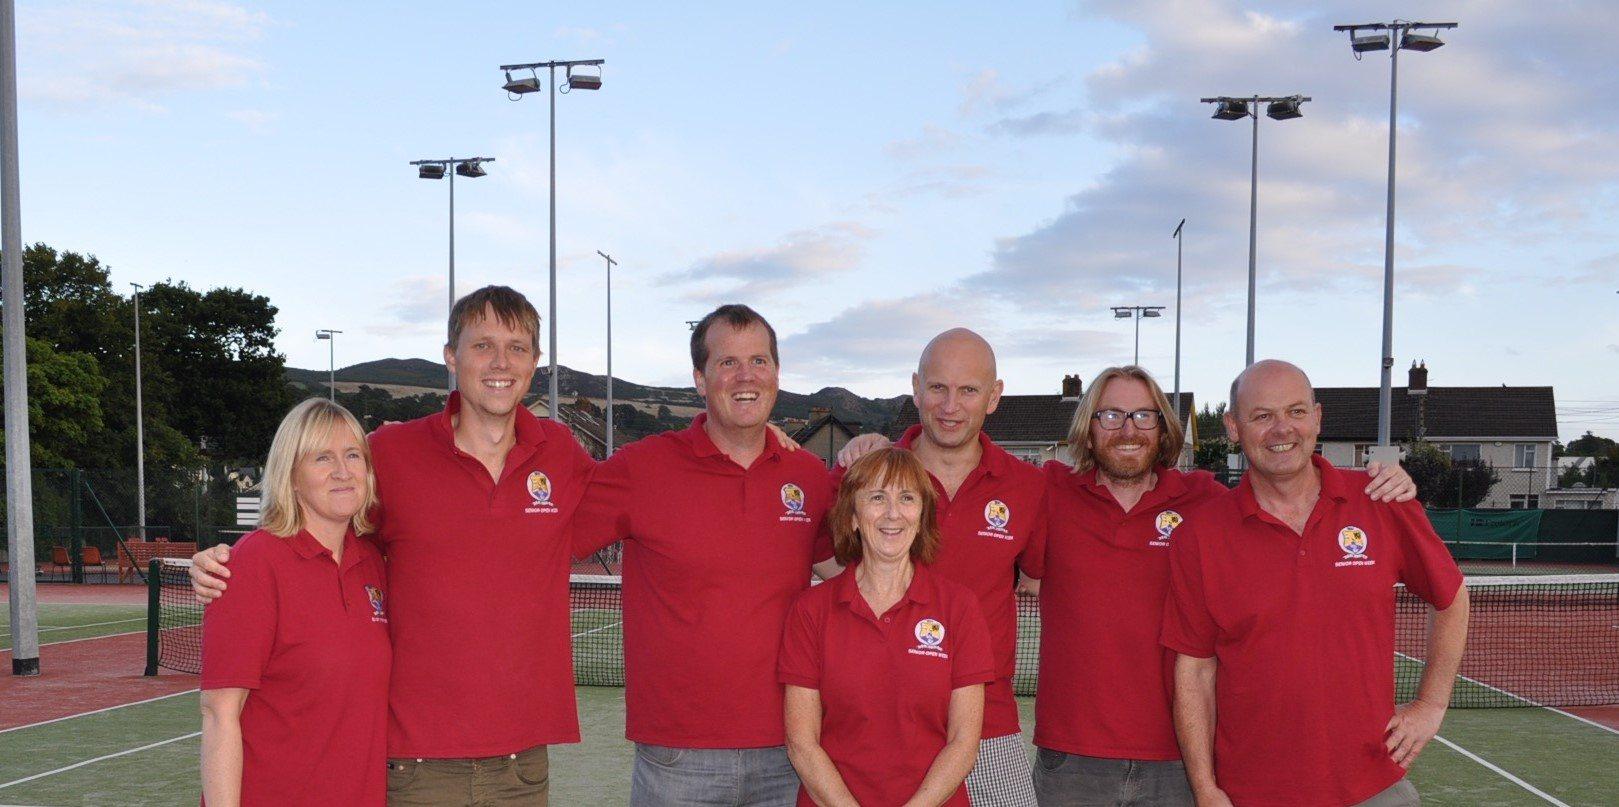 2015-Open-Week-Committee-Jane-Sharp-Paul-Dutton-Kevin-Conroy-Bernie-Flynn-Alan-Connolly-David-Barry-George-Boyle-cropped-